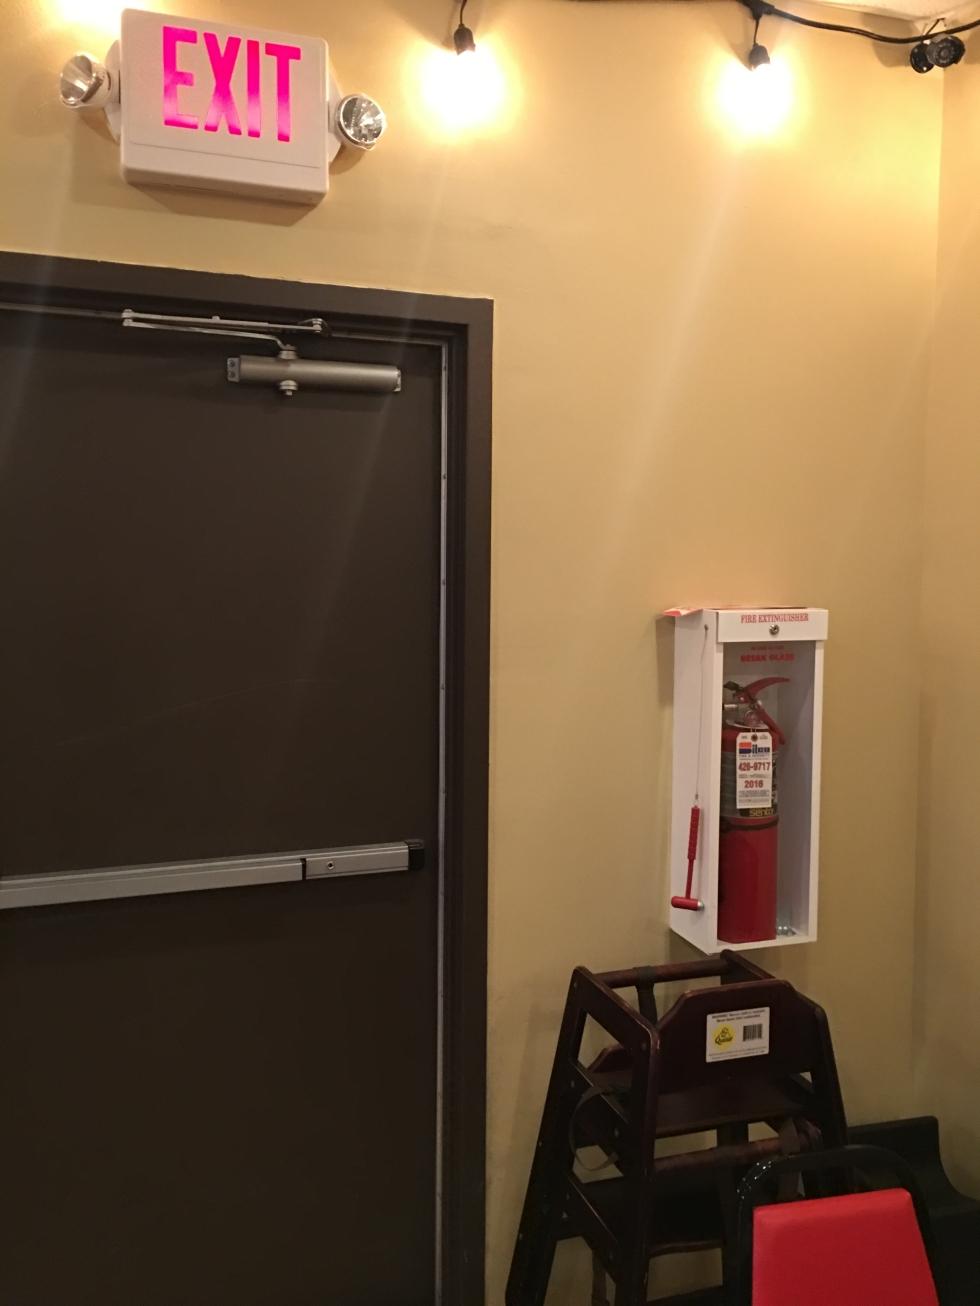 baby extinguisher, extinguisher in restaurants